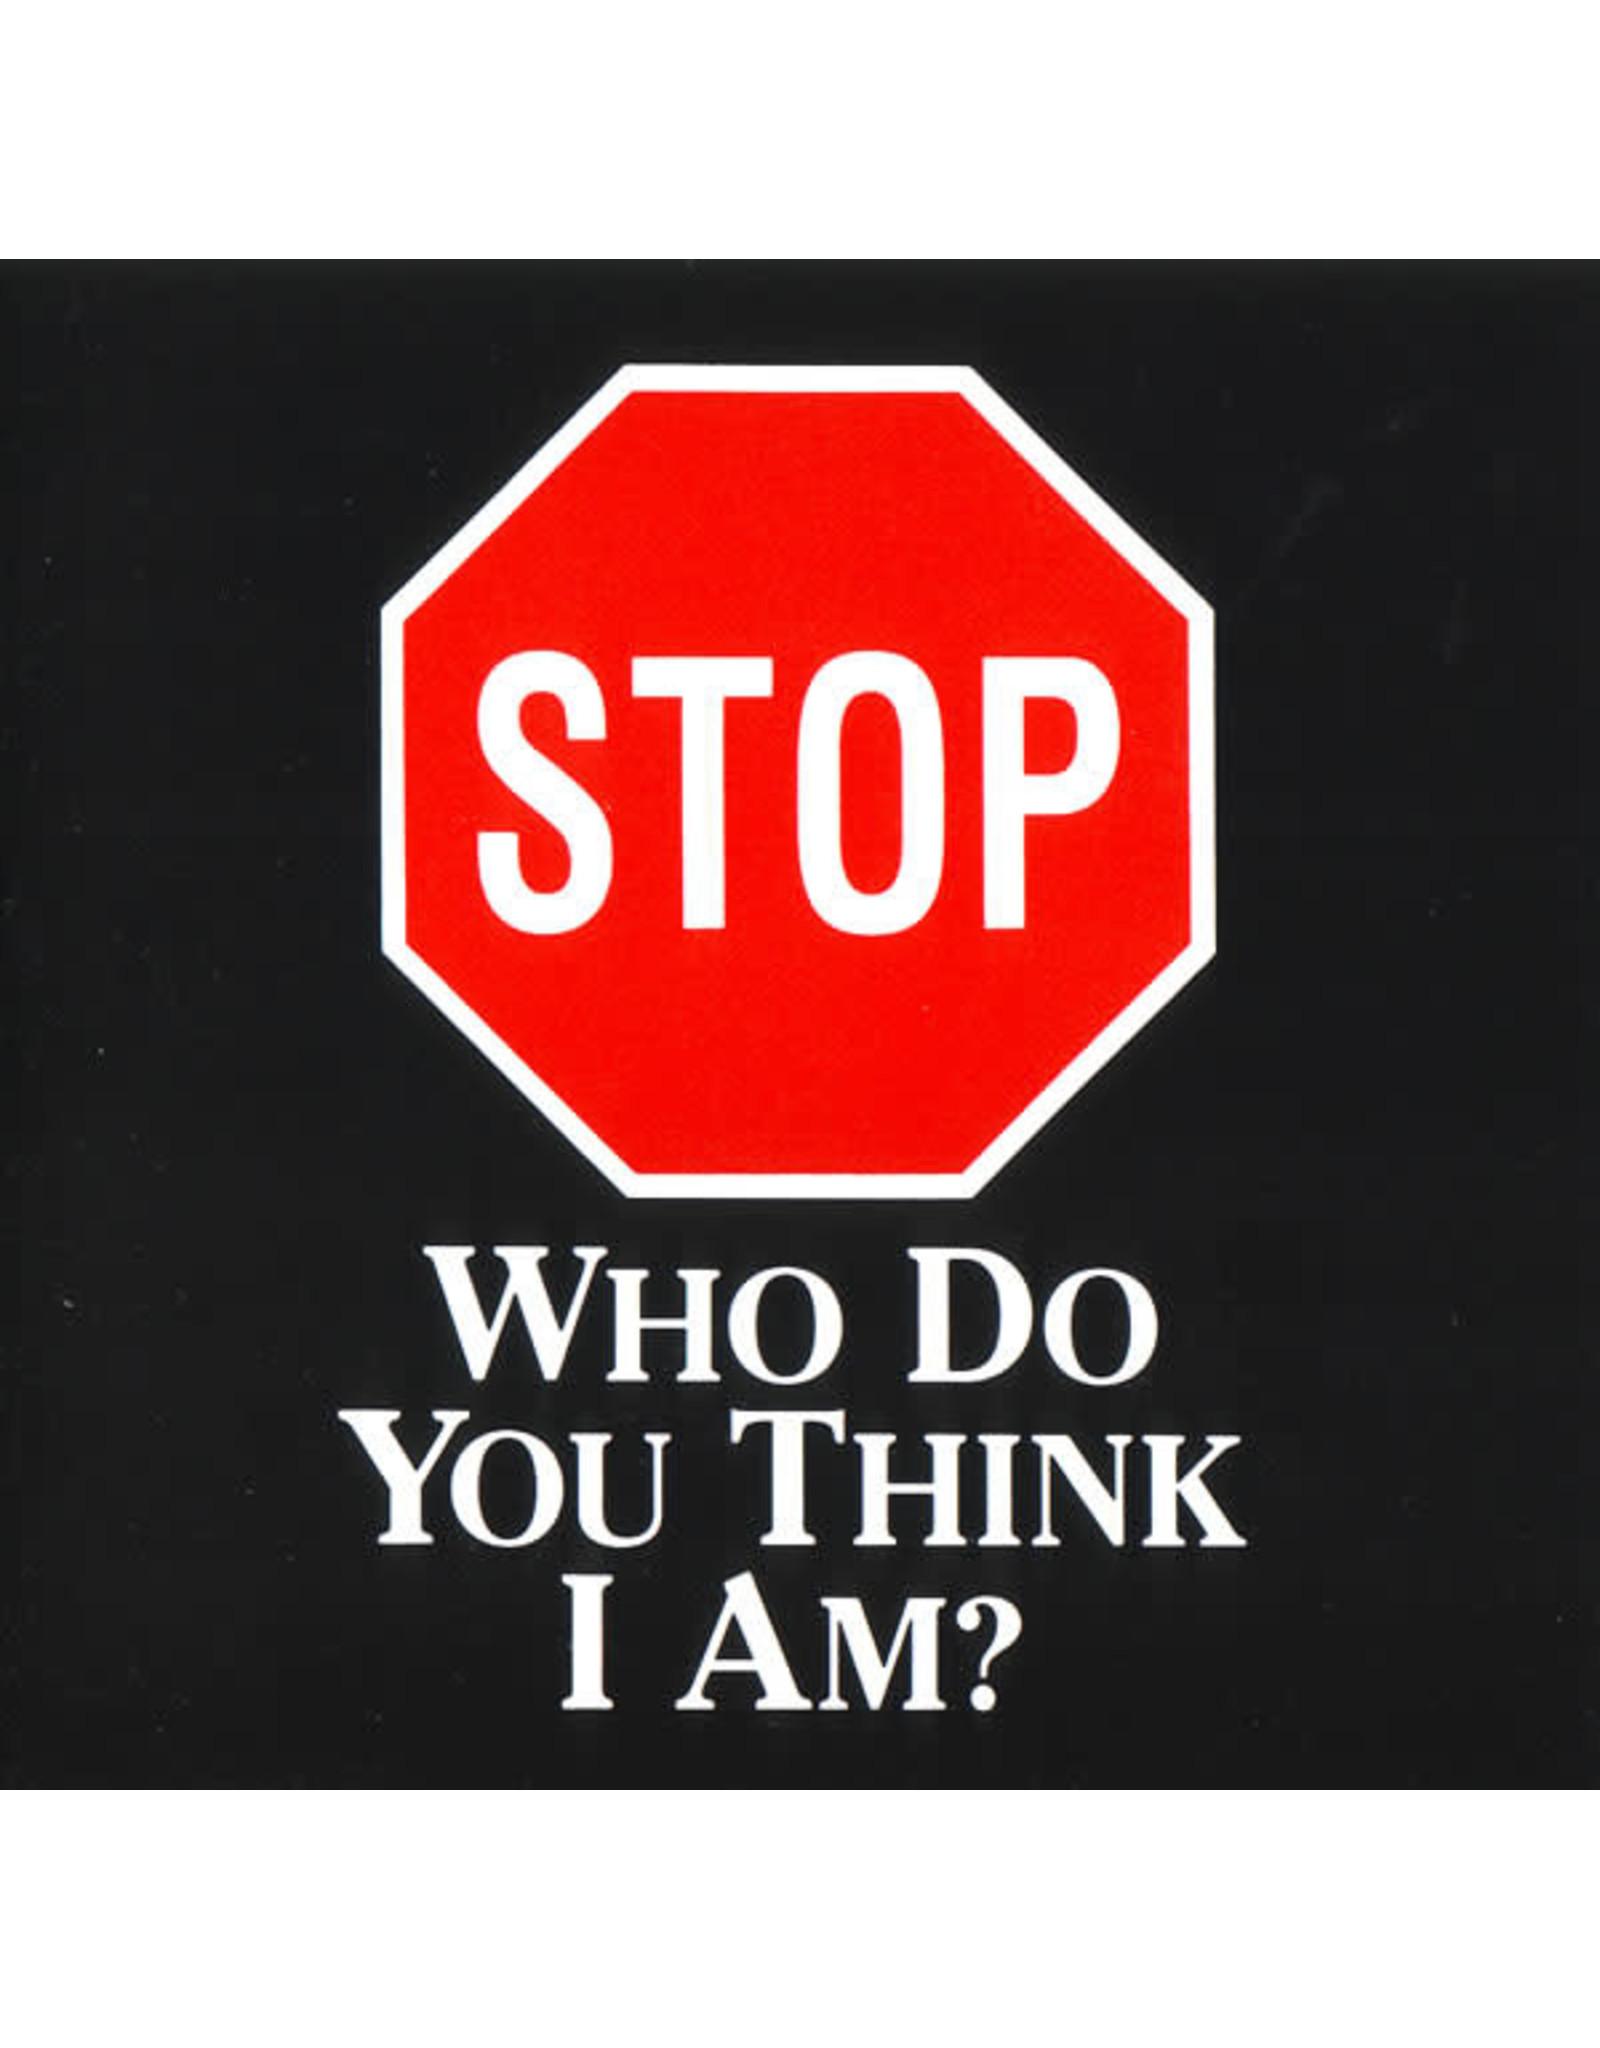 MacArthur Stop! Who Do You Think I Am?